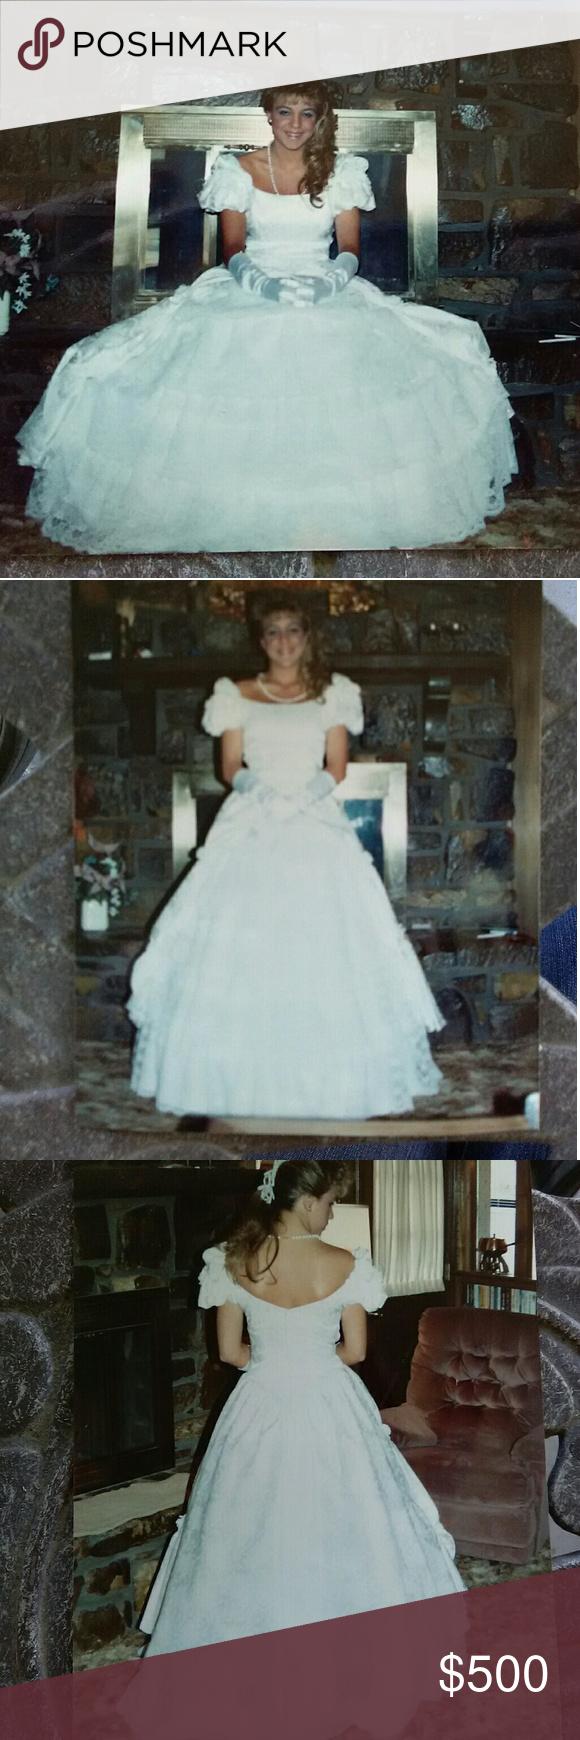 1989 Southern Bell Dress W Hoop Skirt Southern Belle Dress Belle Dress Hoop Skirt [ 1740 x 580 Pixel ]